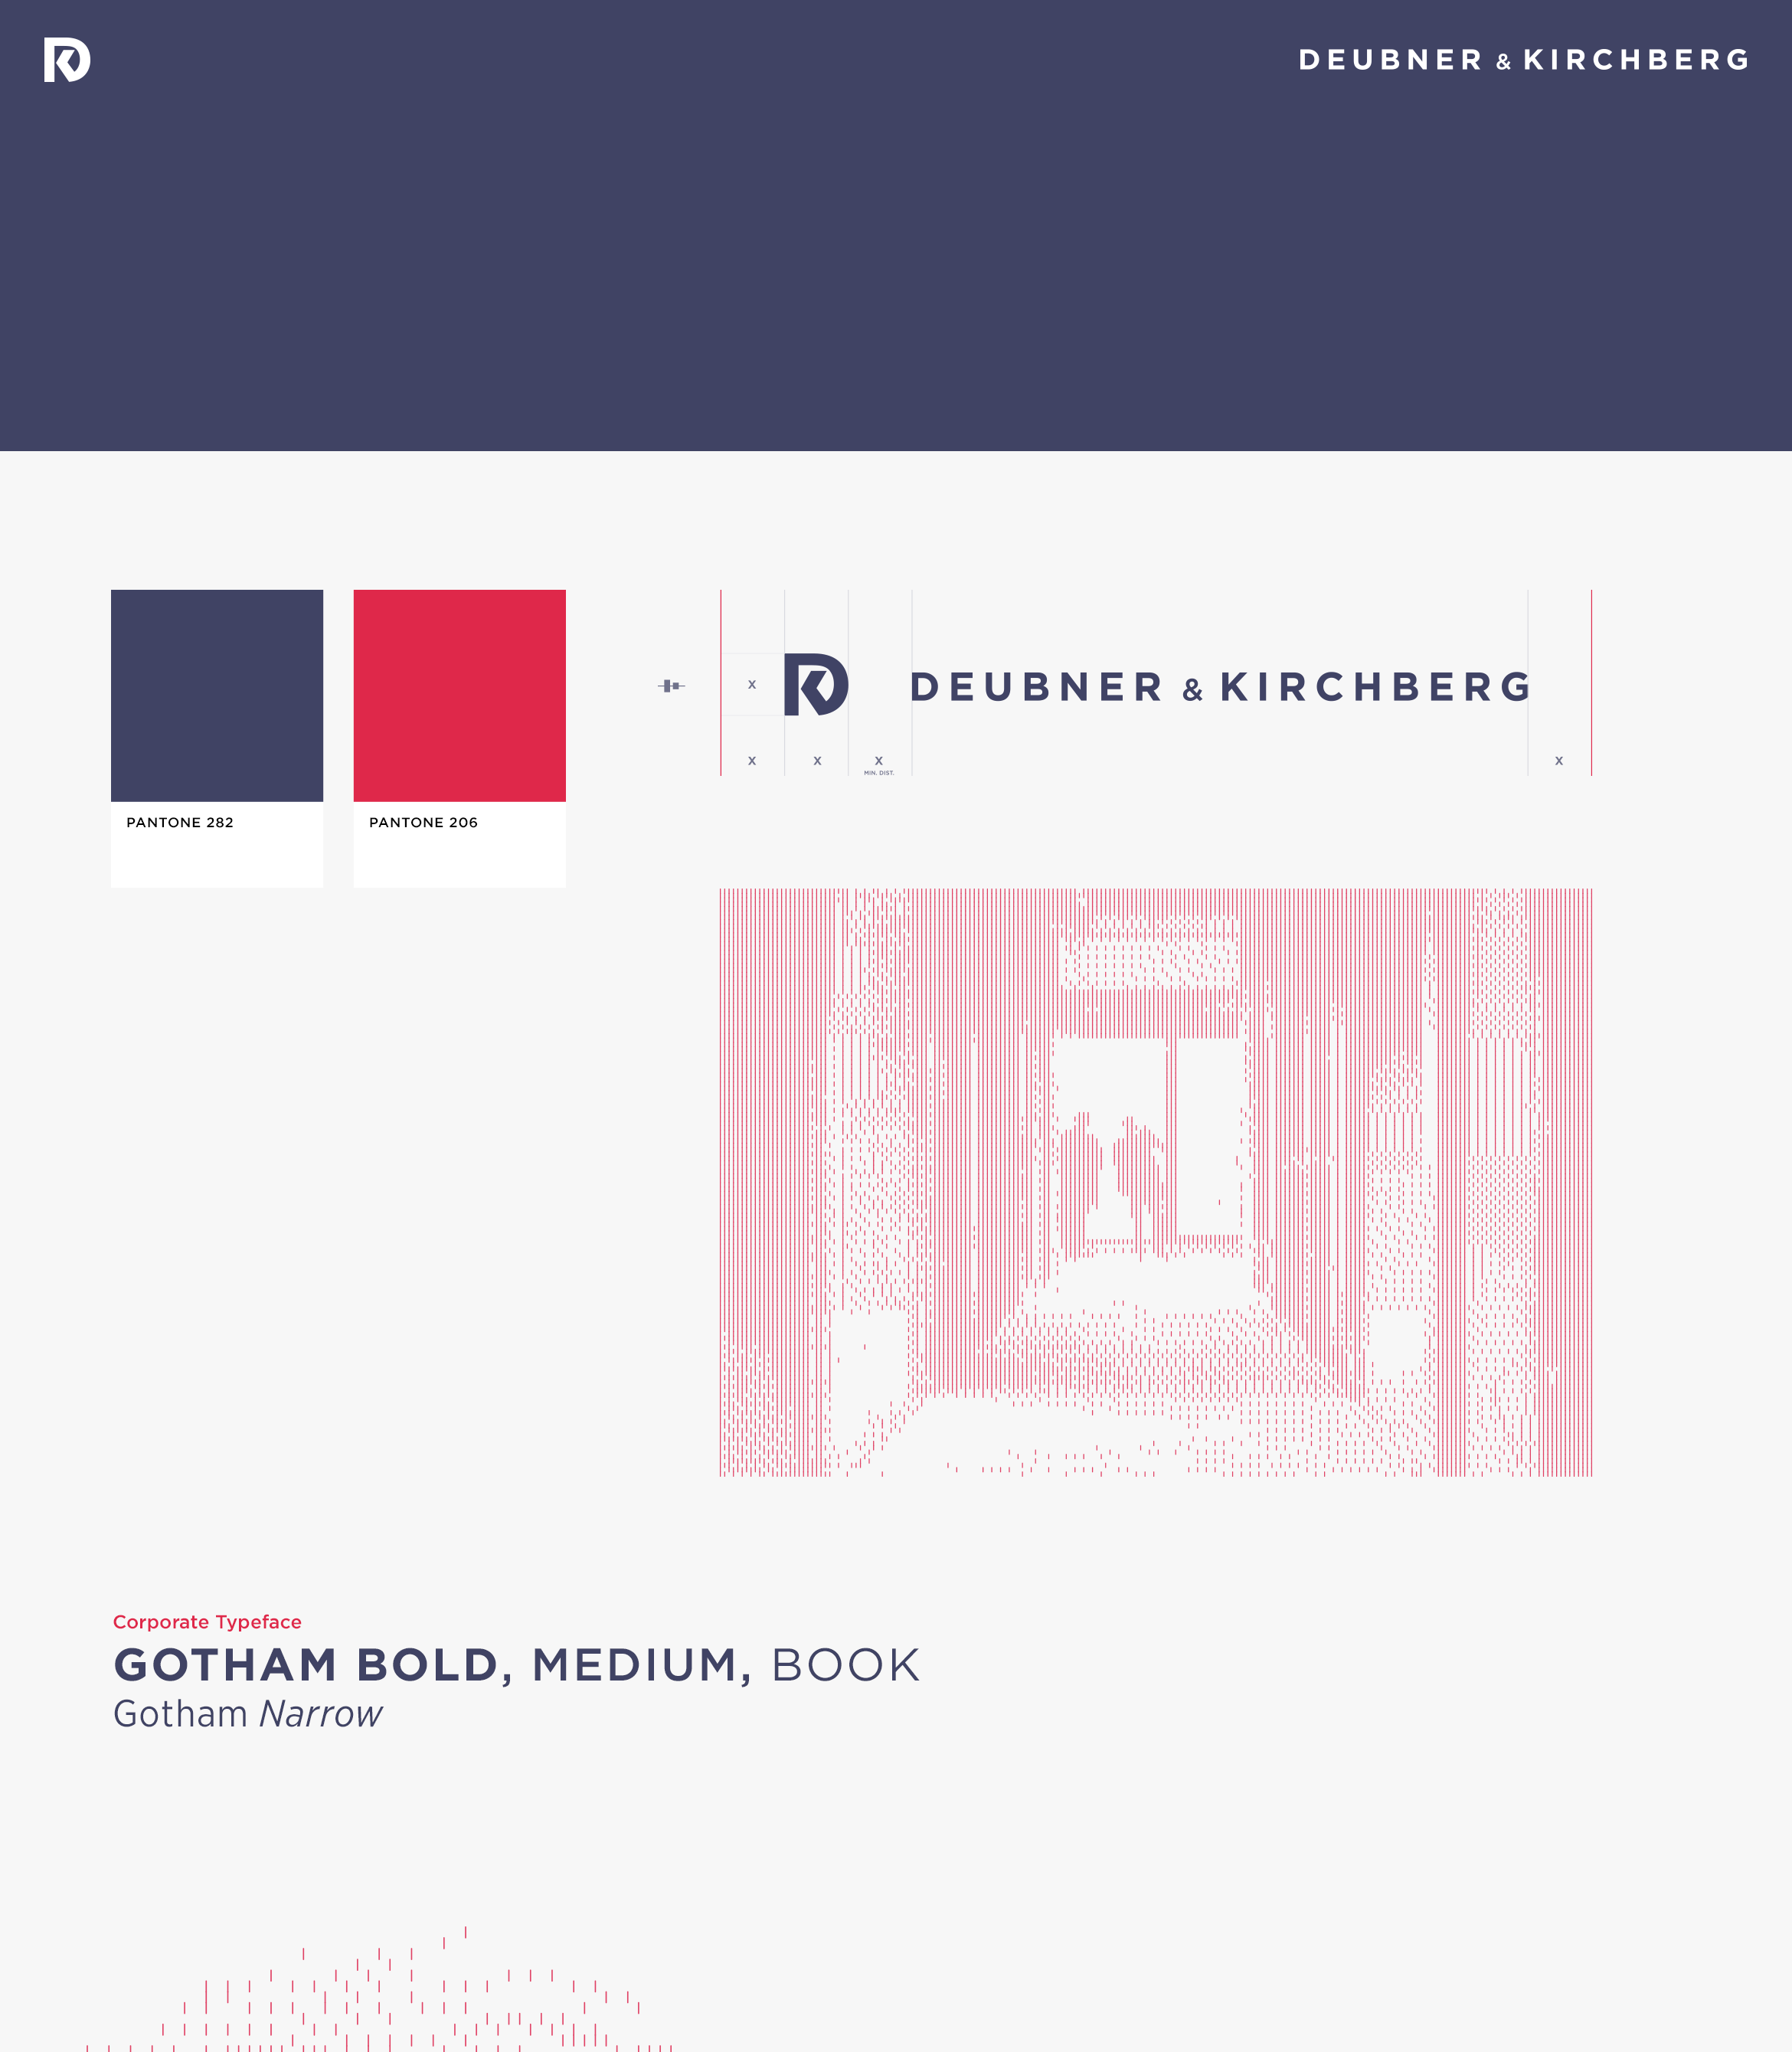 deubnerkirchberg-design-bueroink